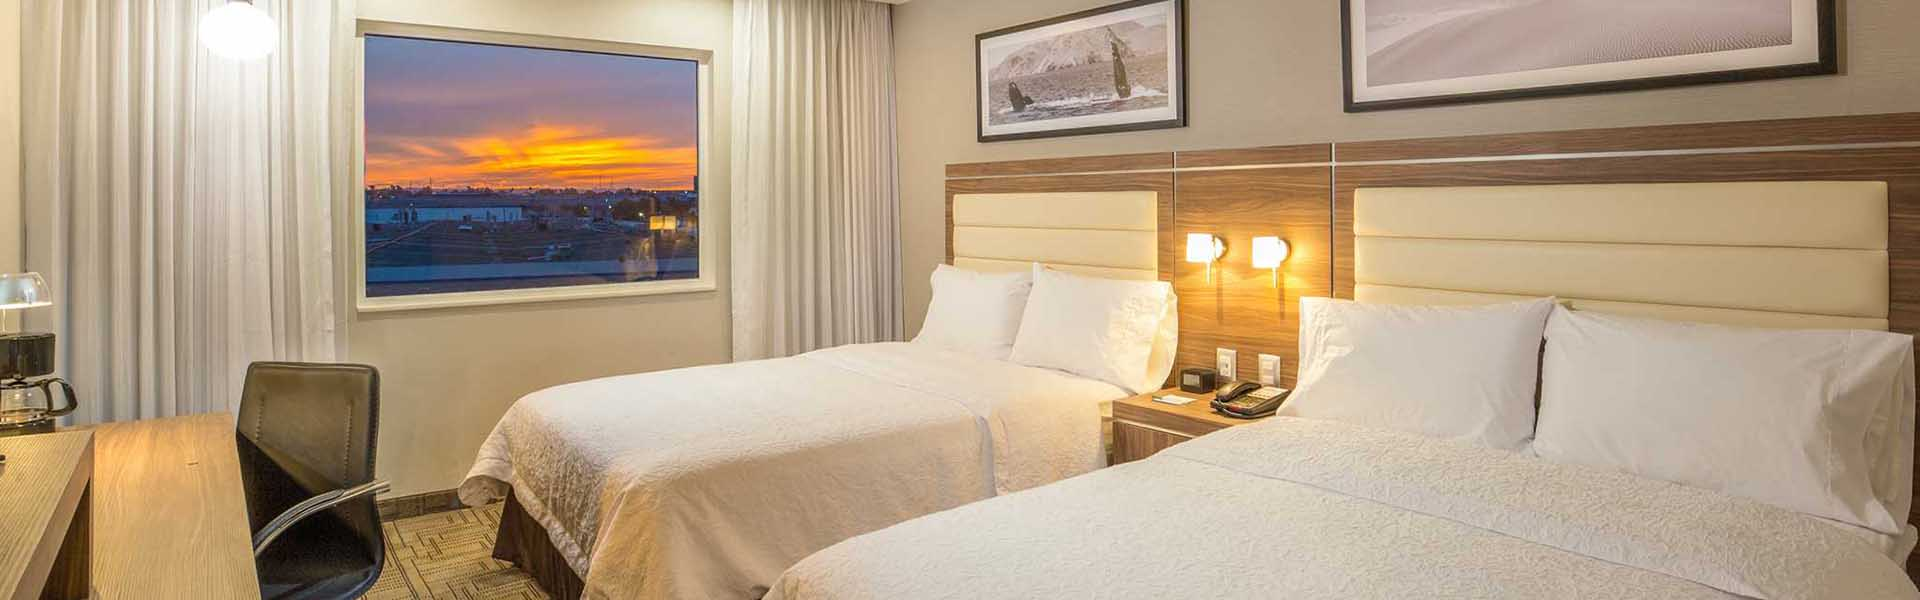 hotel-hampton-tijuana